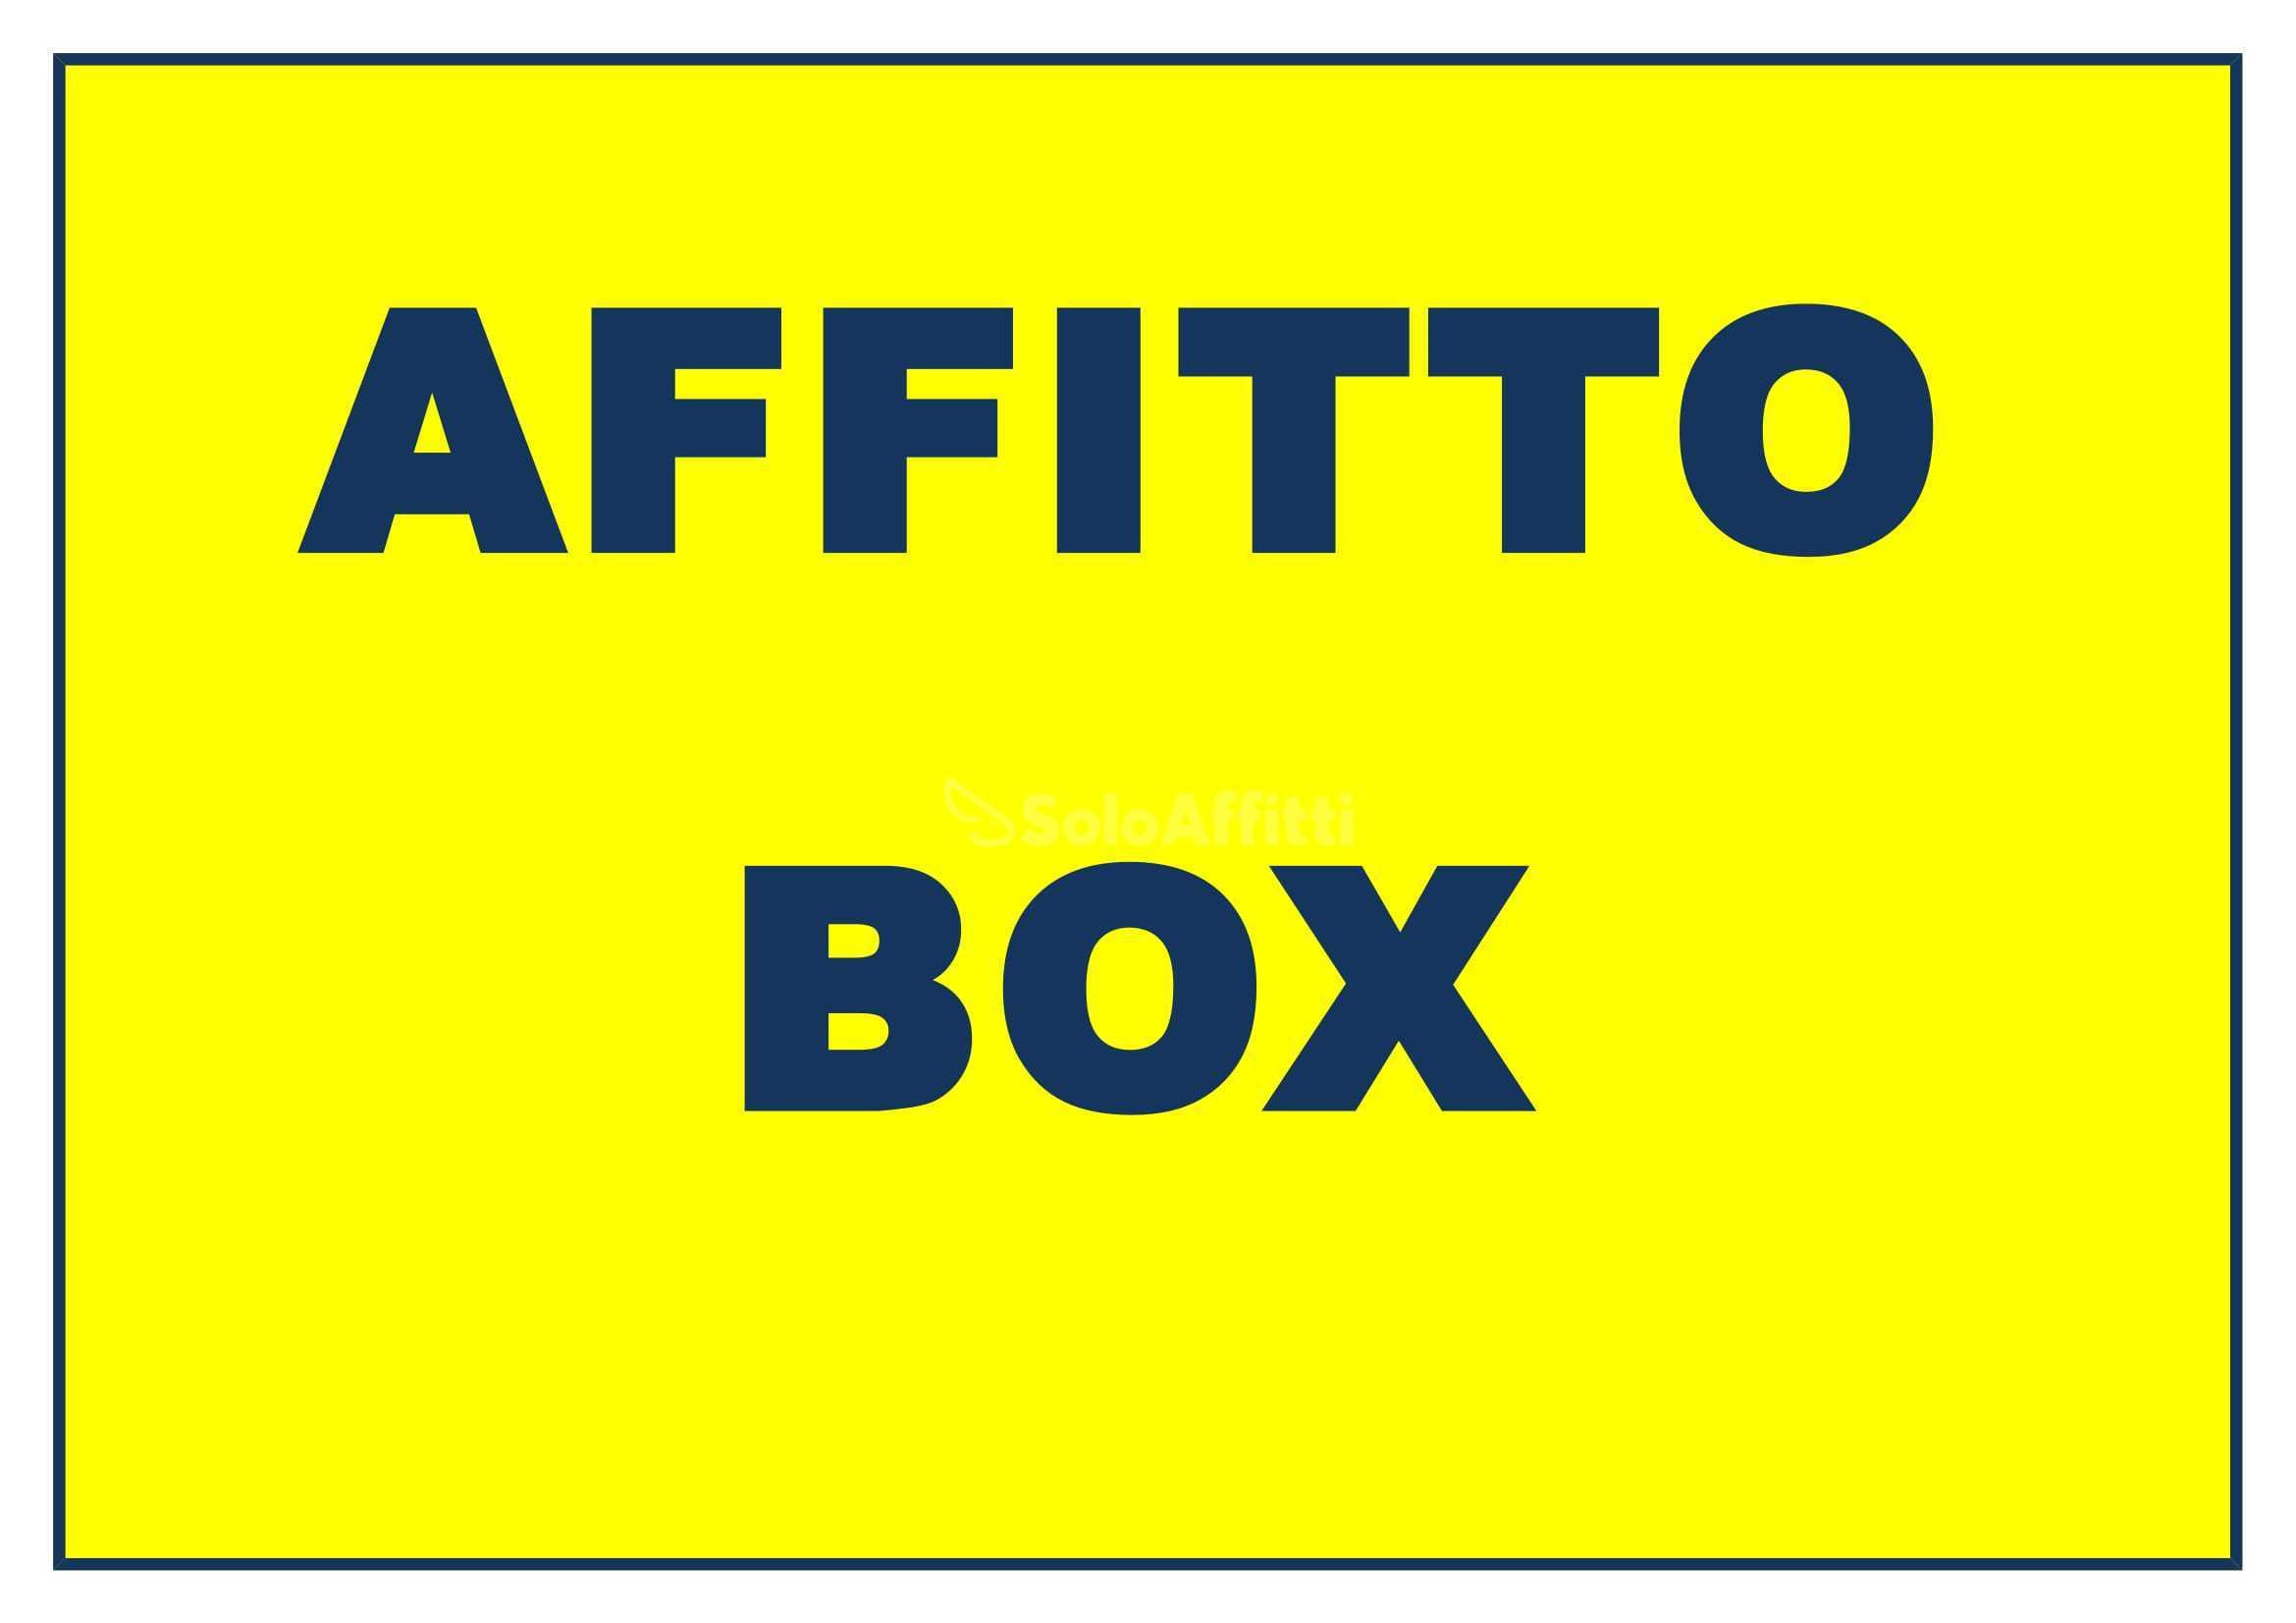 AFFITTO BOX-1.jpg